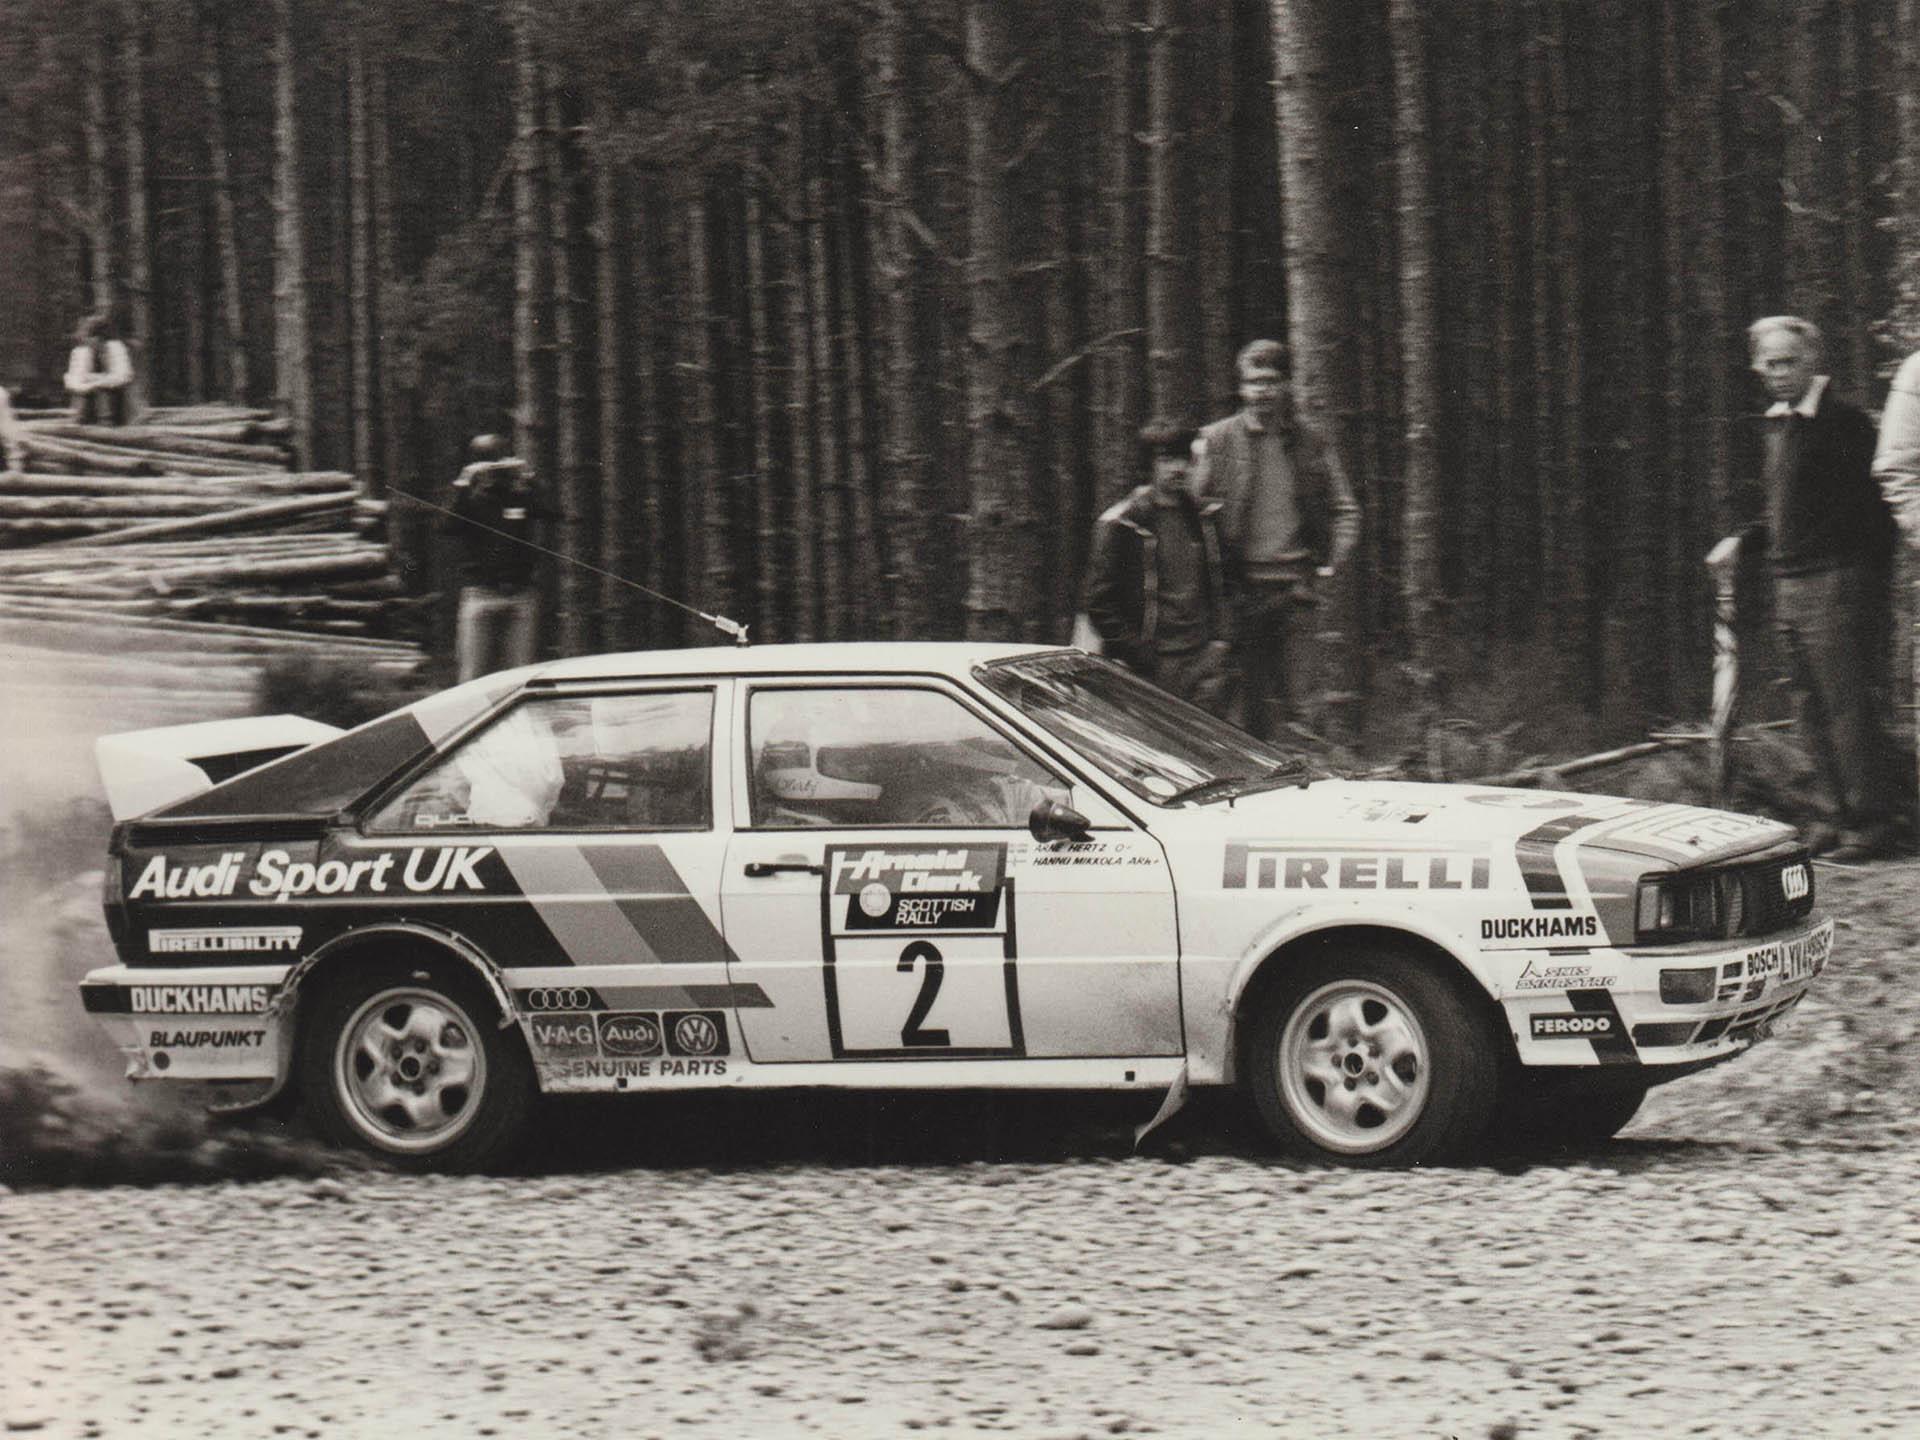 Audi Sport UK Press Release 09/09/1982